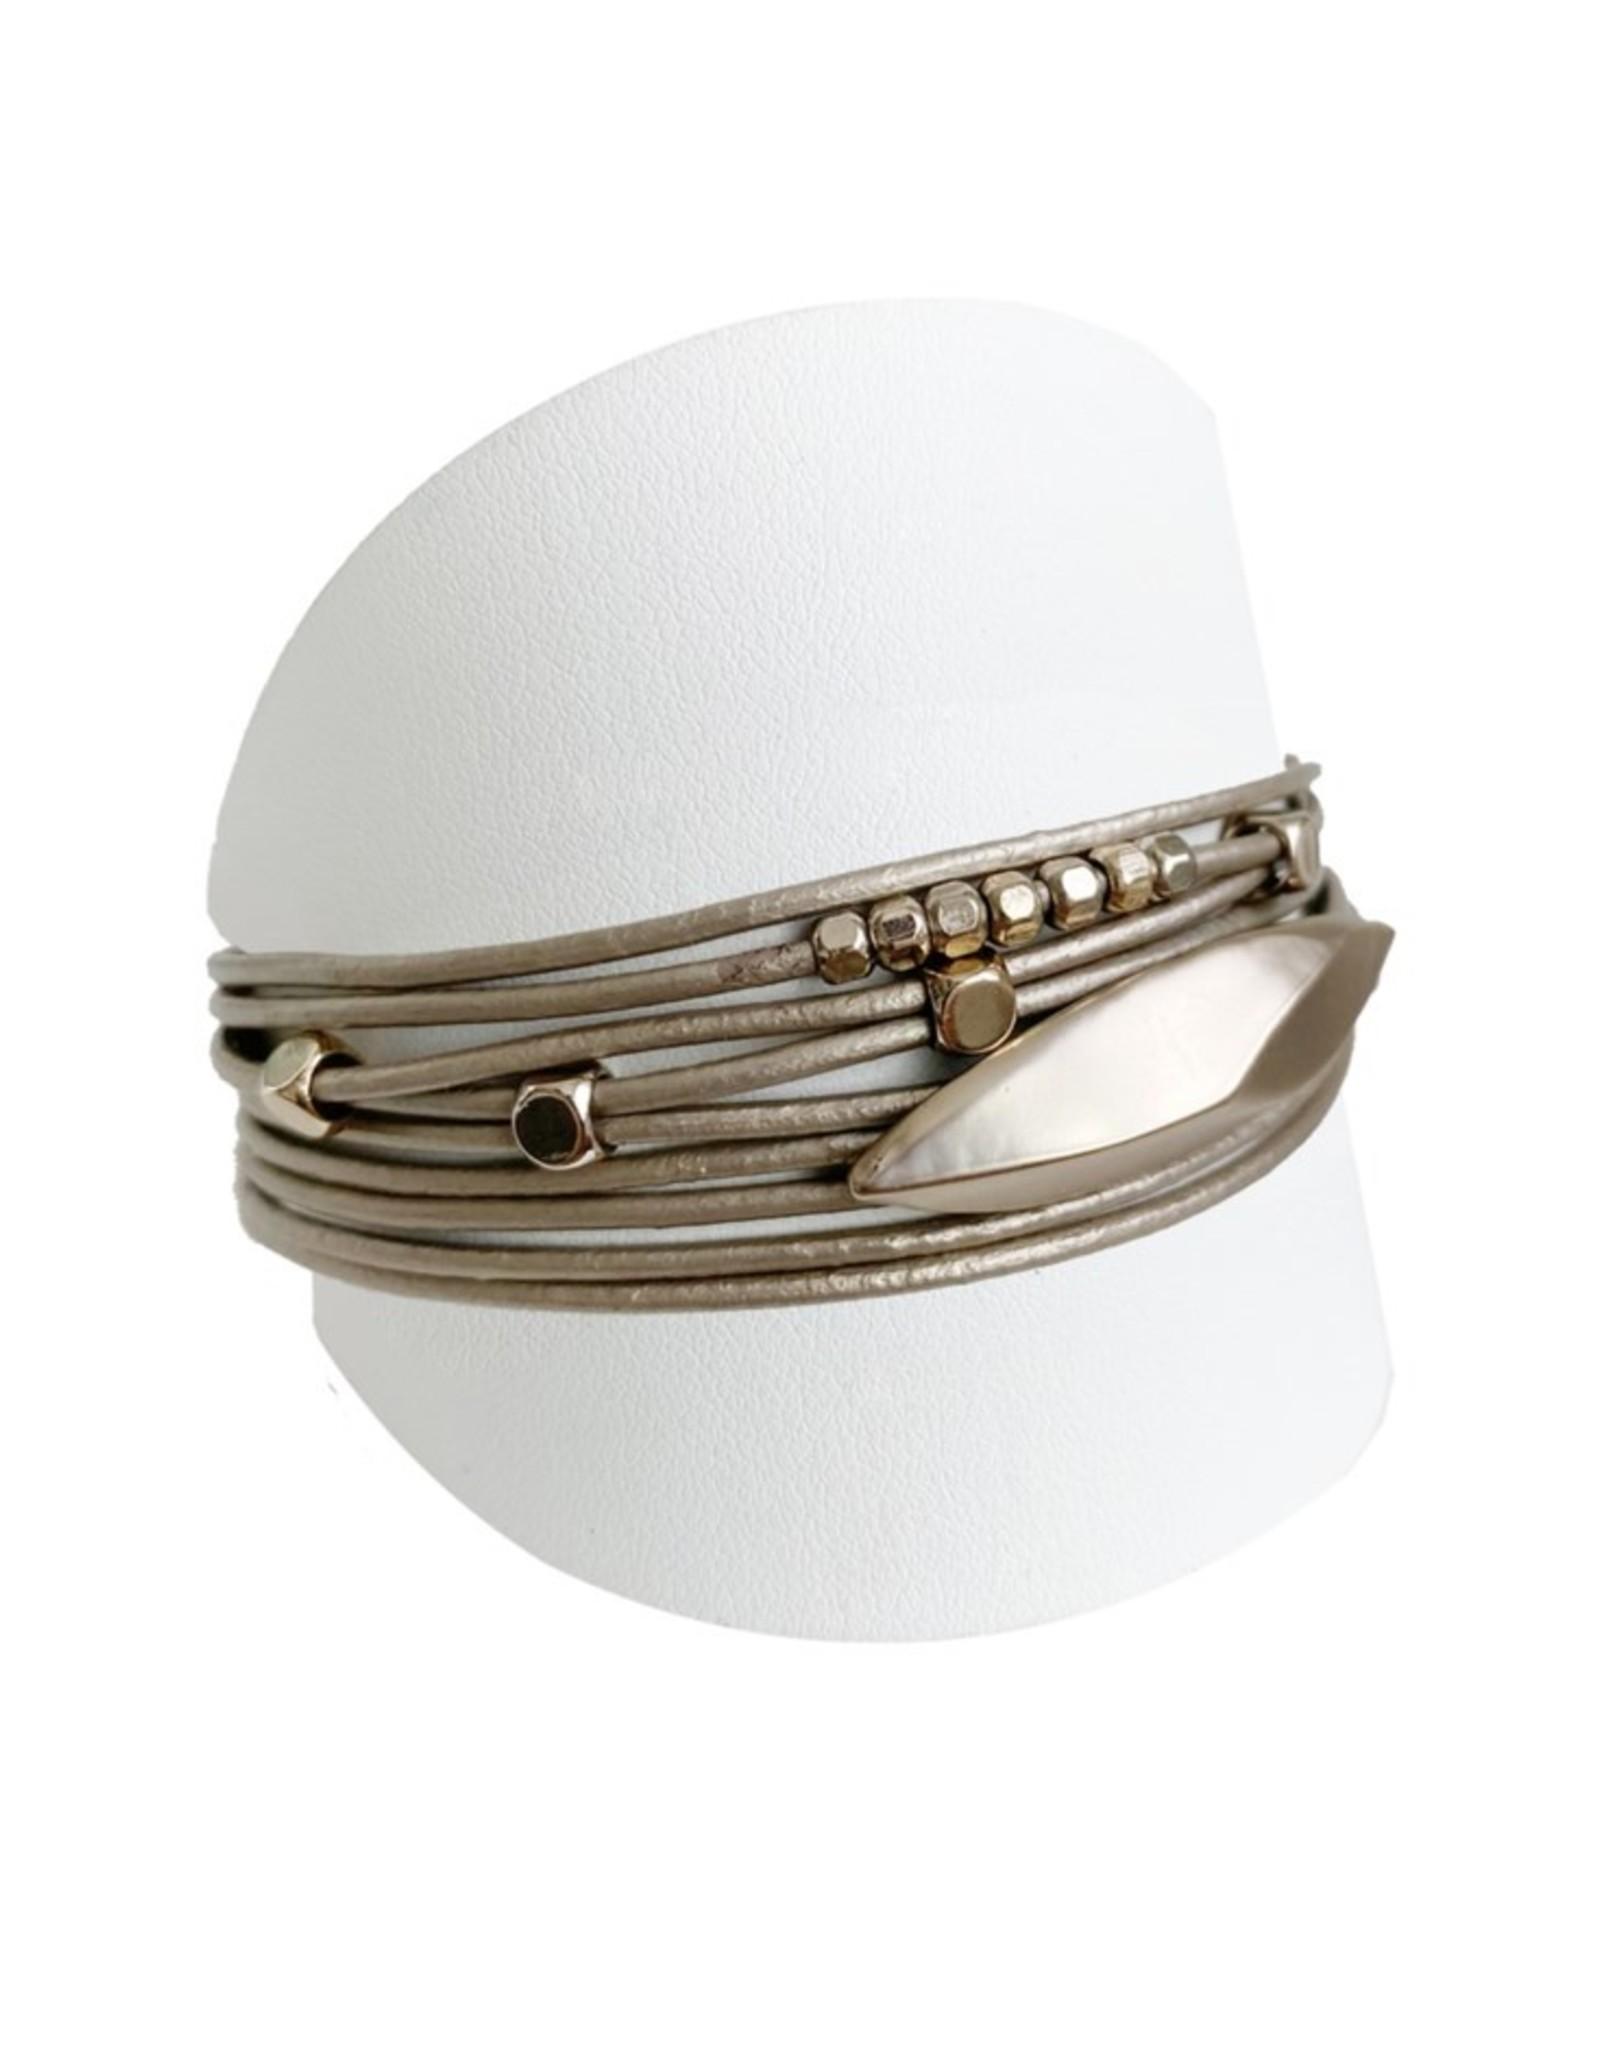 Bracelet multirang taupe et or